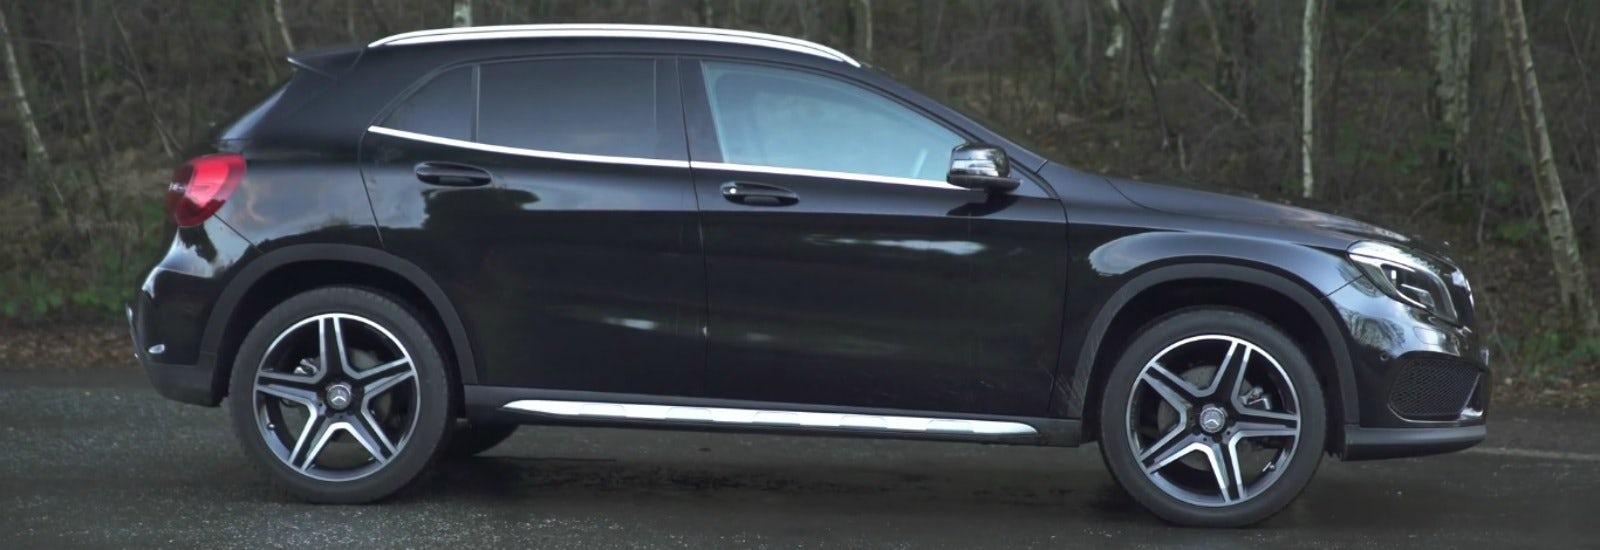 Bmw X1 Mercedes Gla And Audi Q3 Video Group Test Carwow